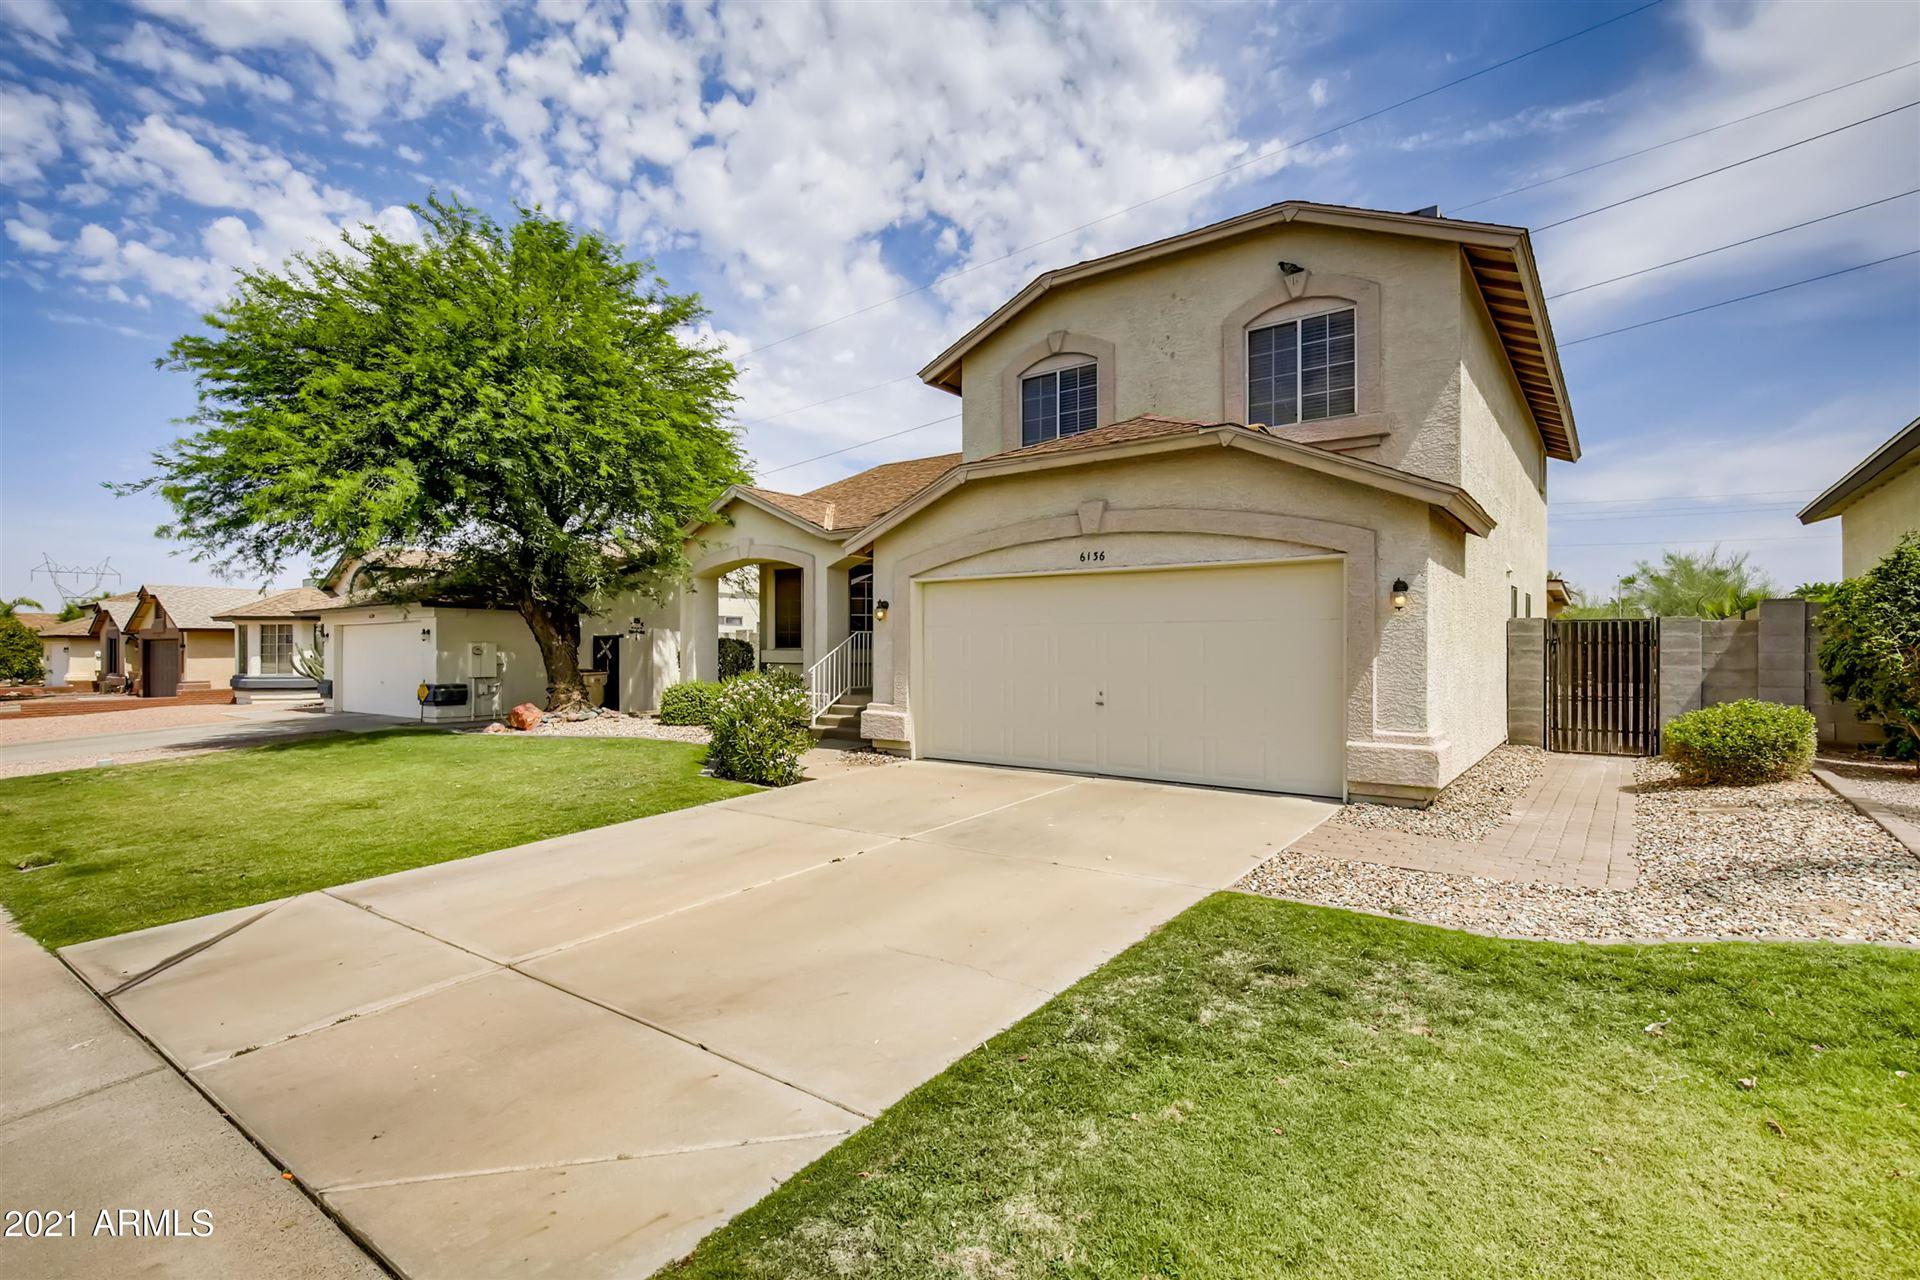 6136 E COLBY Street, Mesa, AZ 85205 - MLS#: 6253917